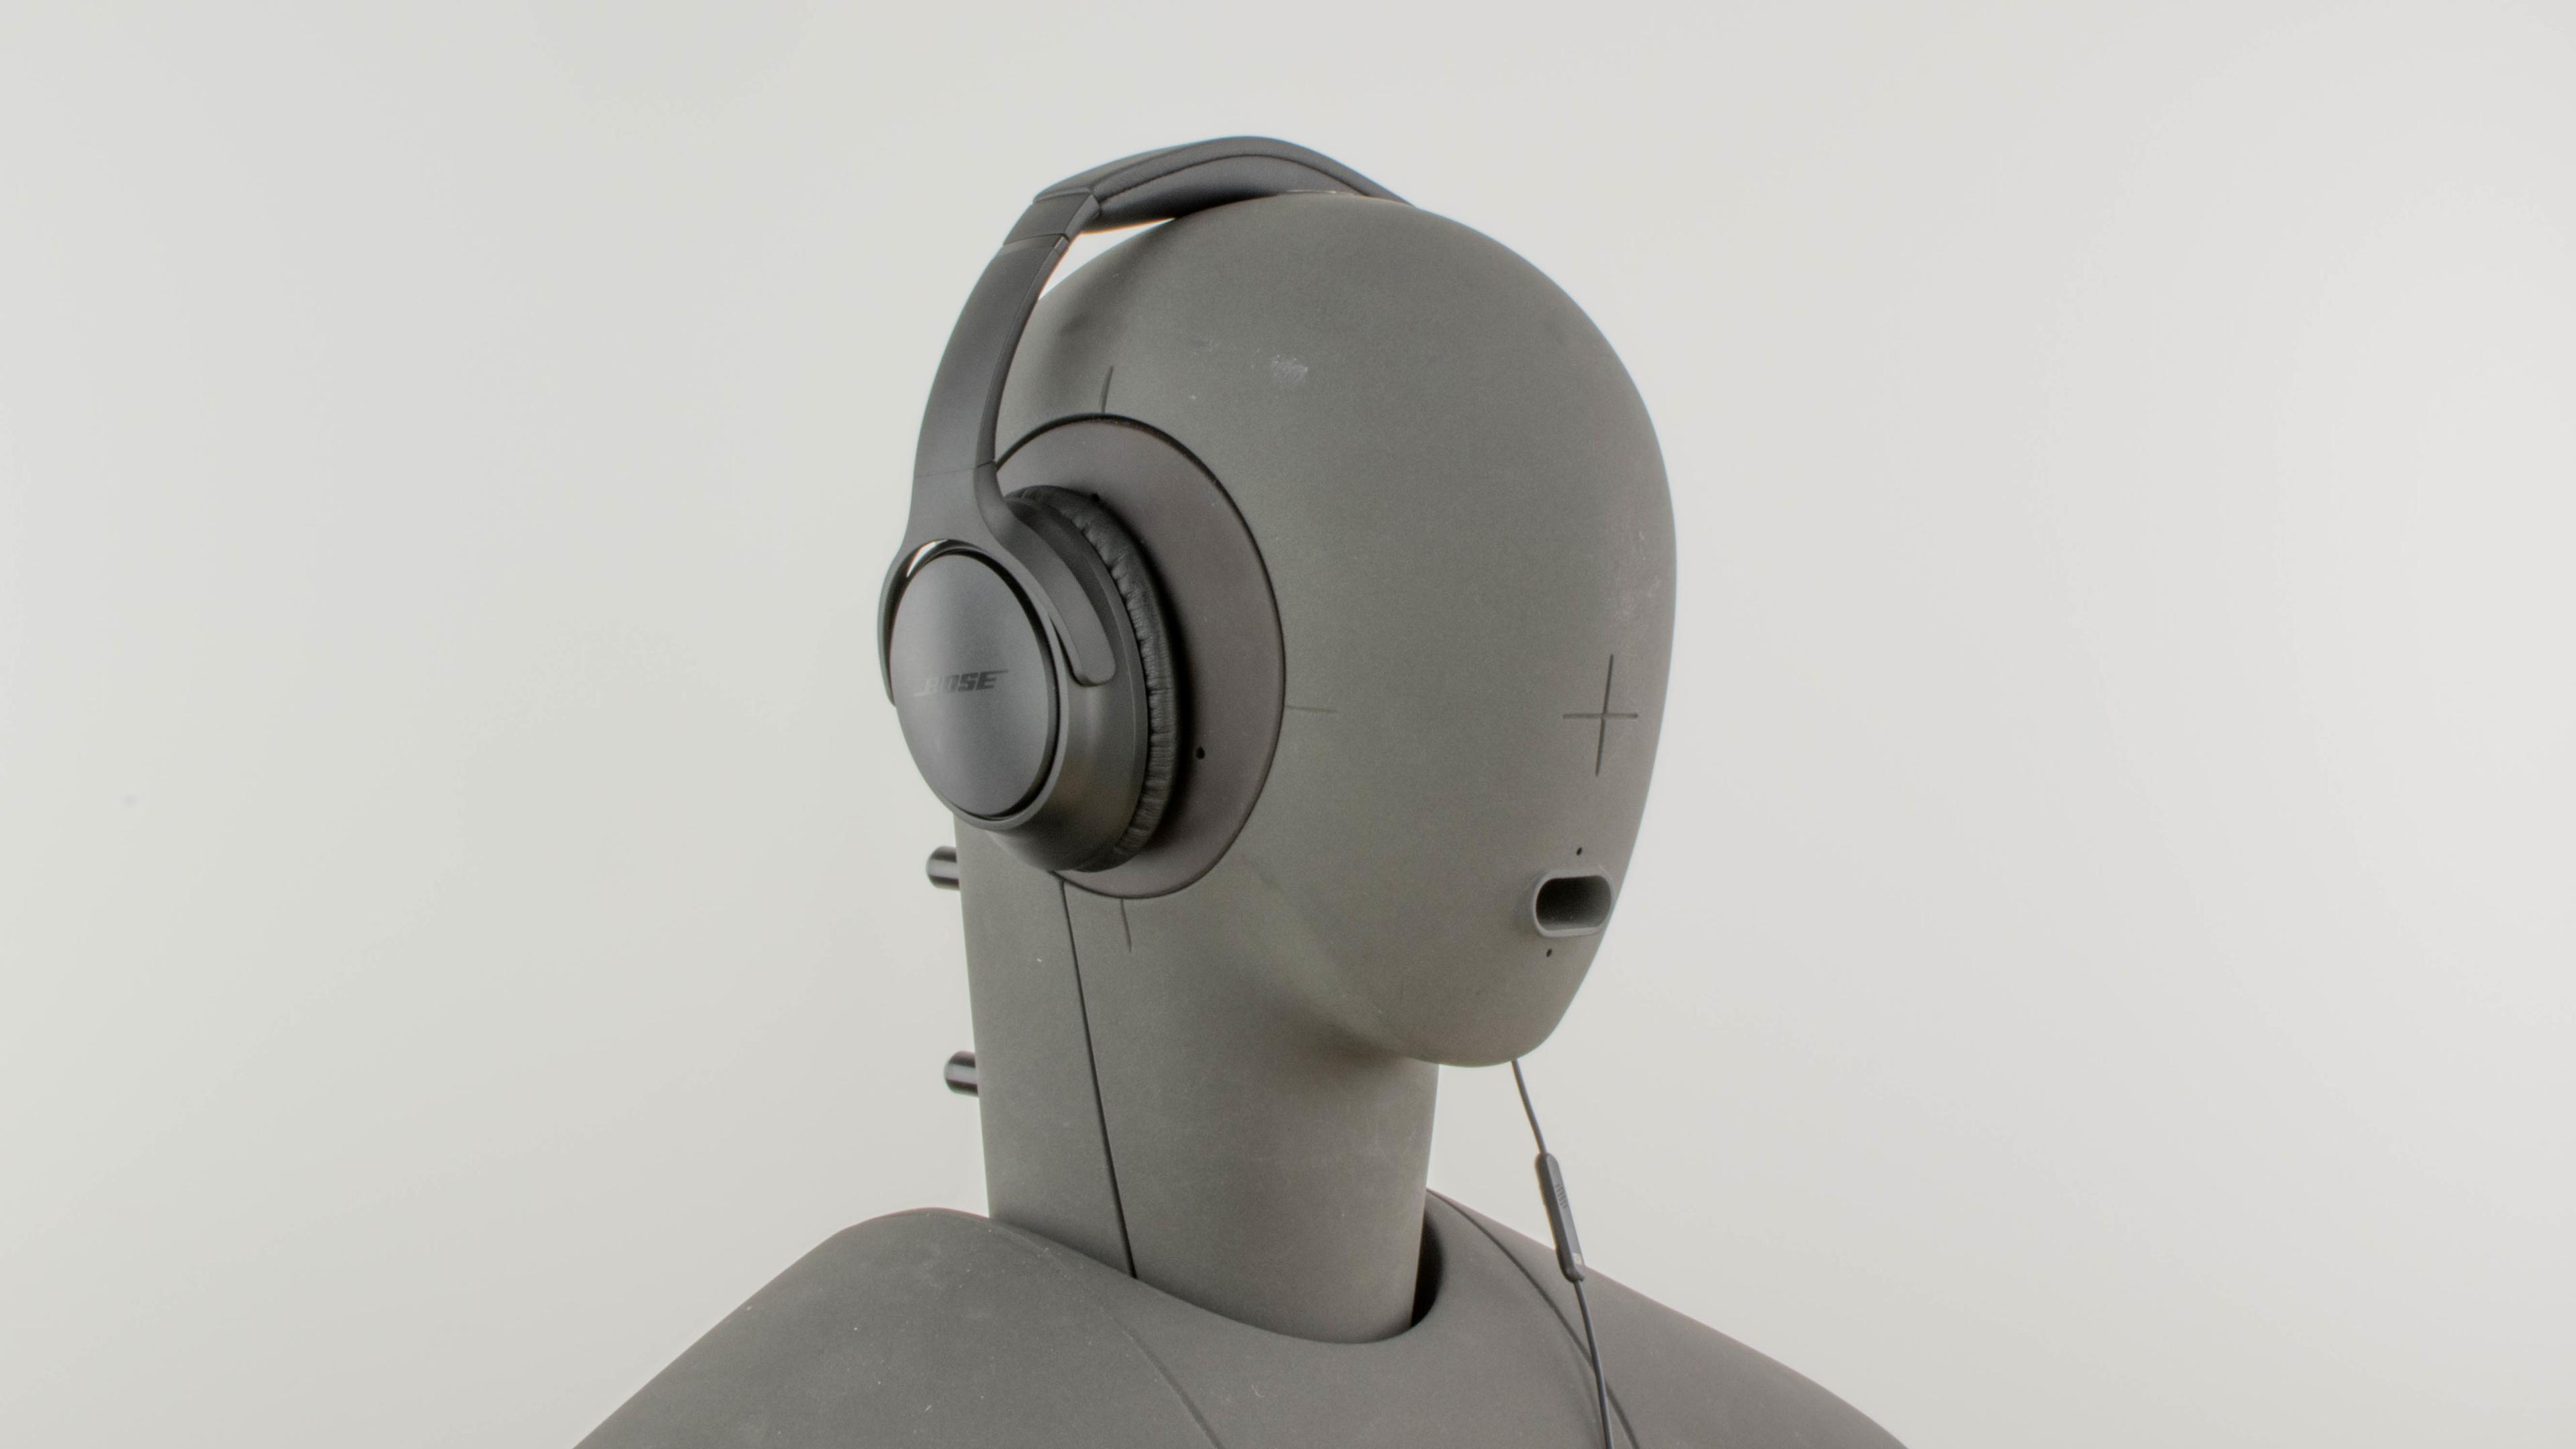 bose usb audio